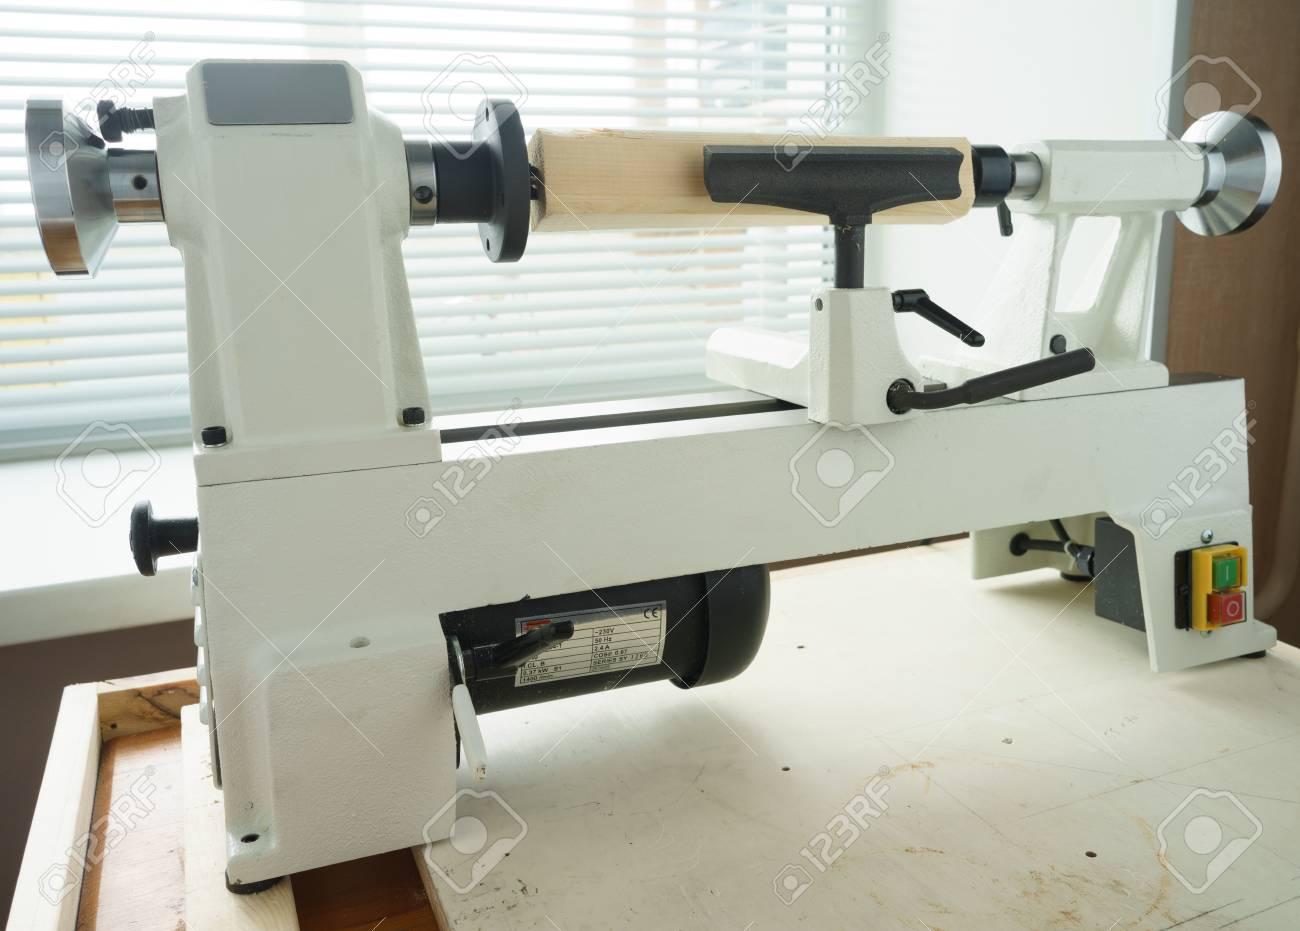 woodworking machine, mini woodworking lathe close up detail,..